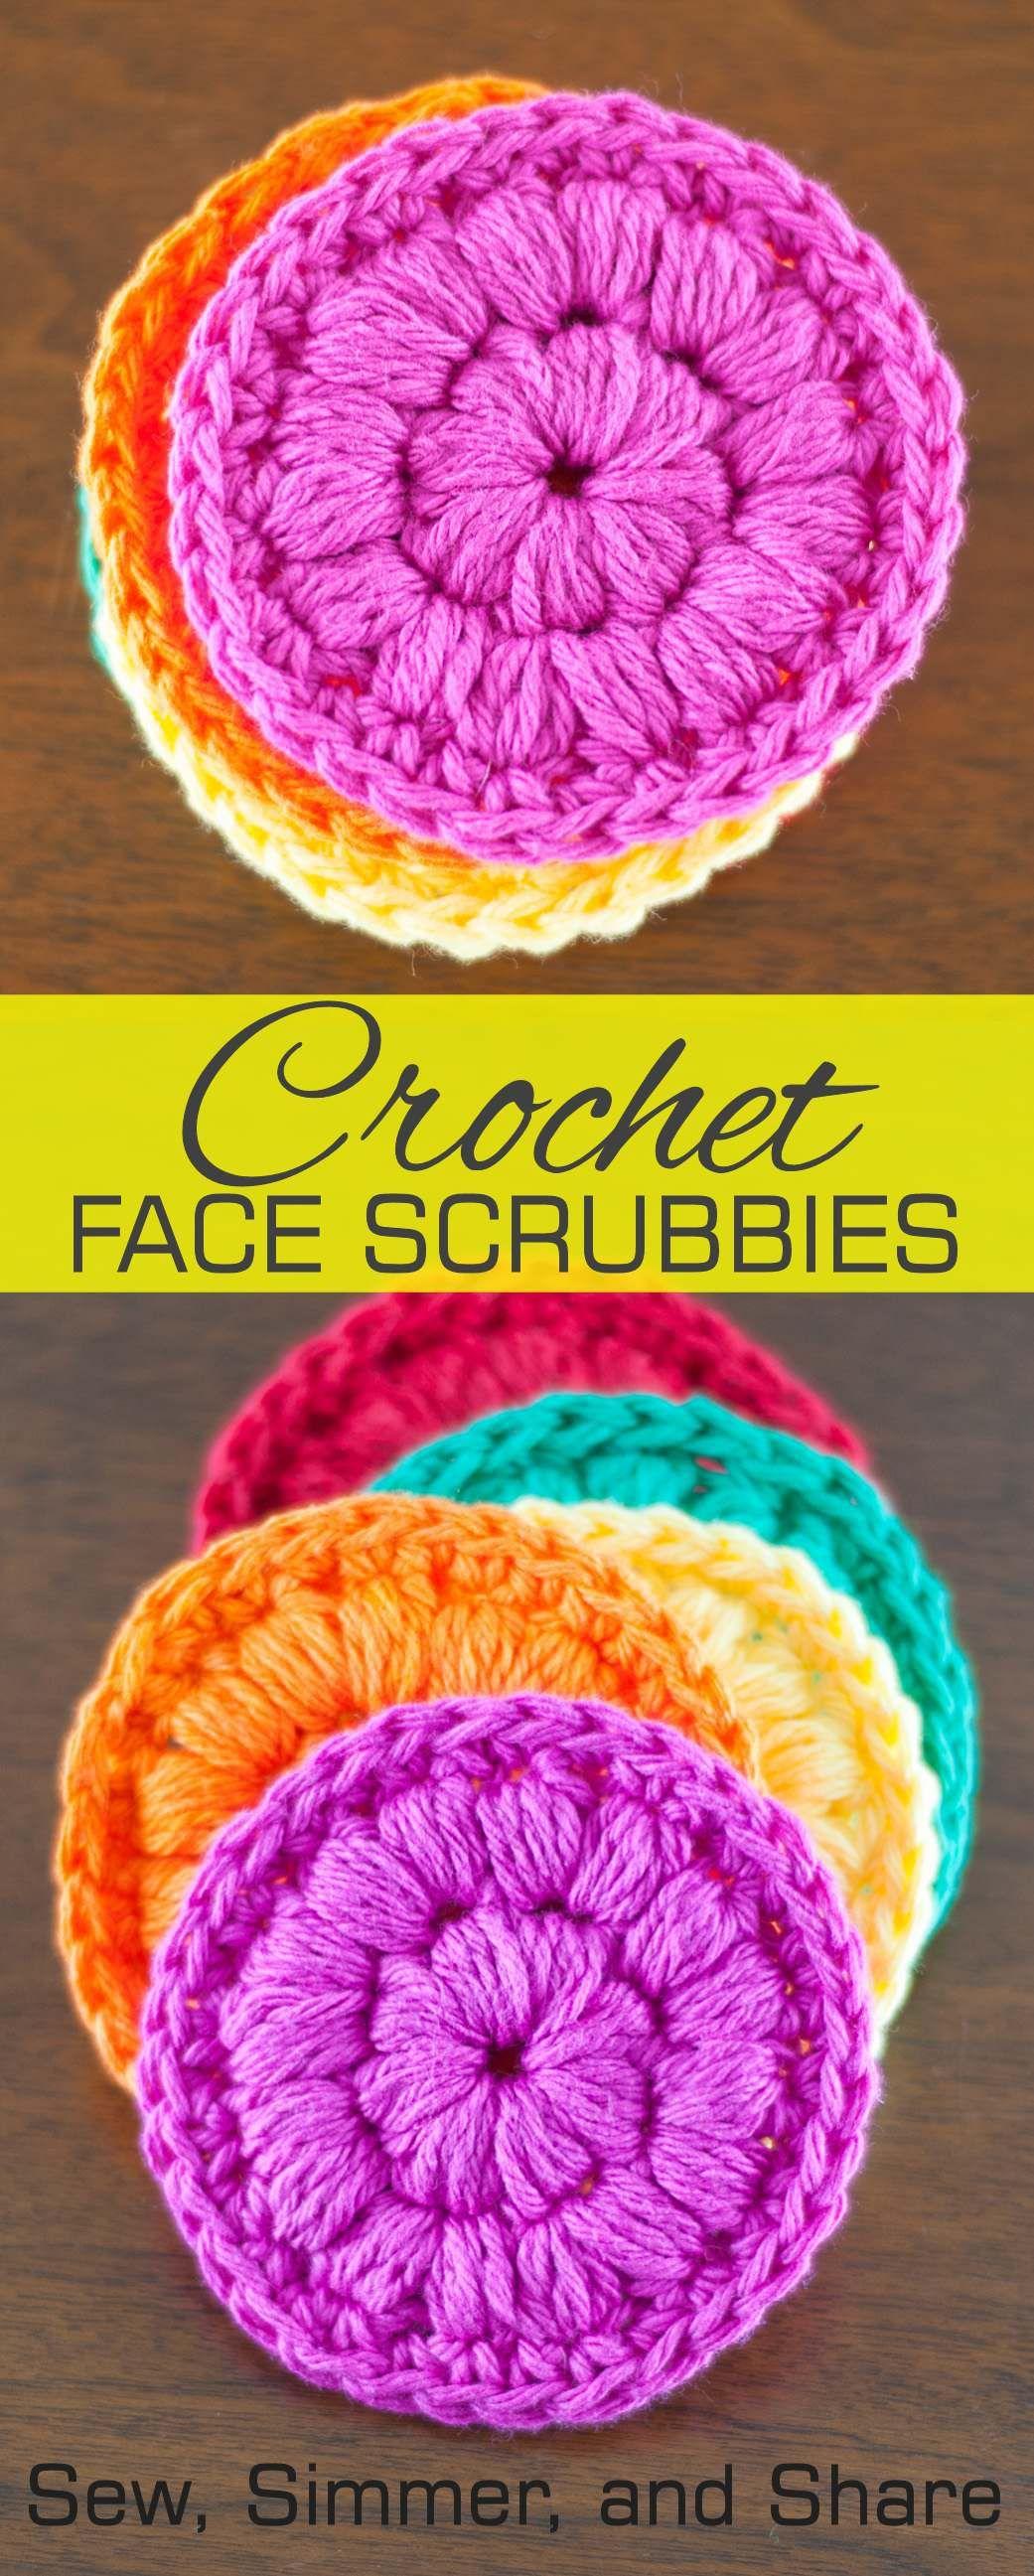 Crochet Face Scrubbies | Rostros, Puntadas y Croché